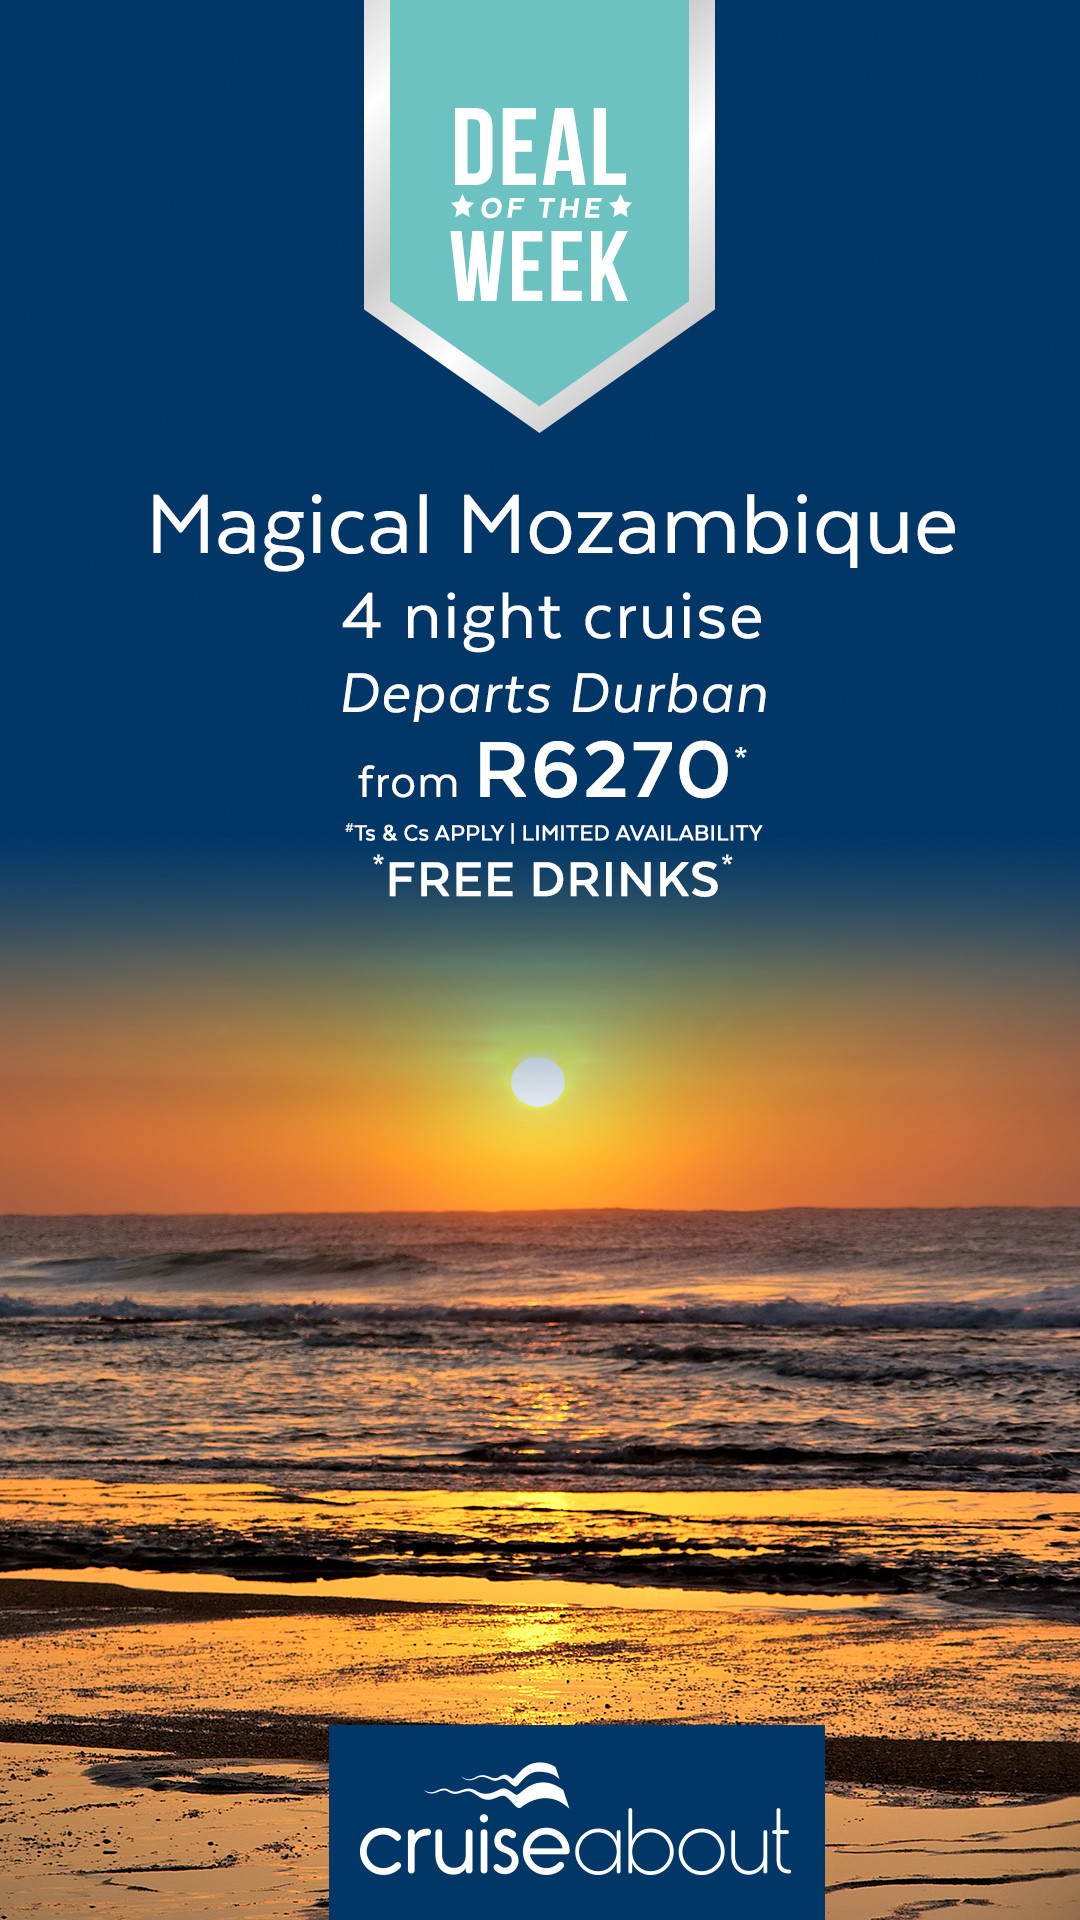 Magical Mozambique